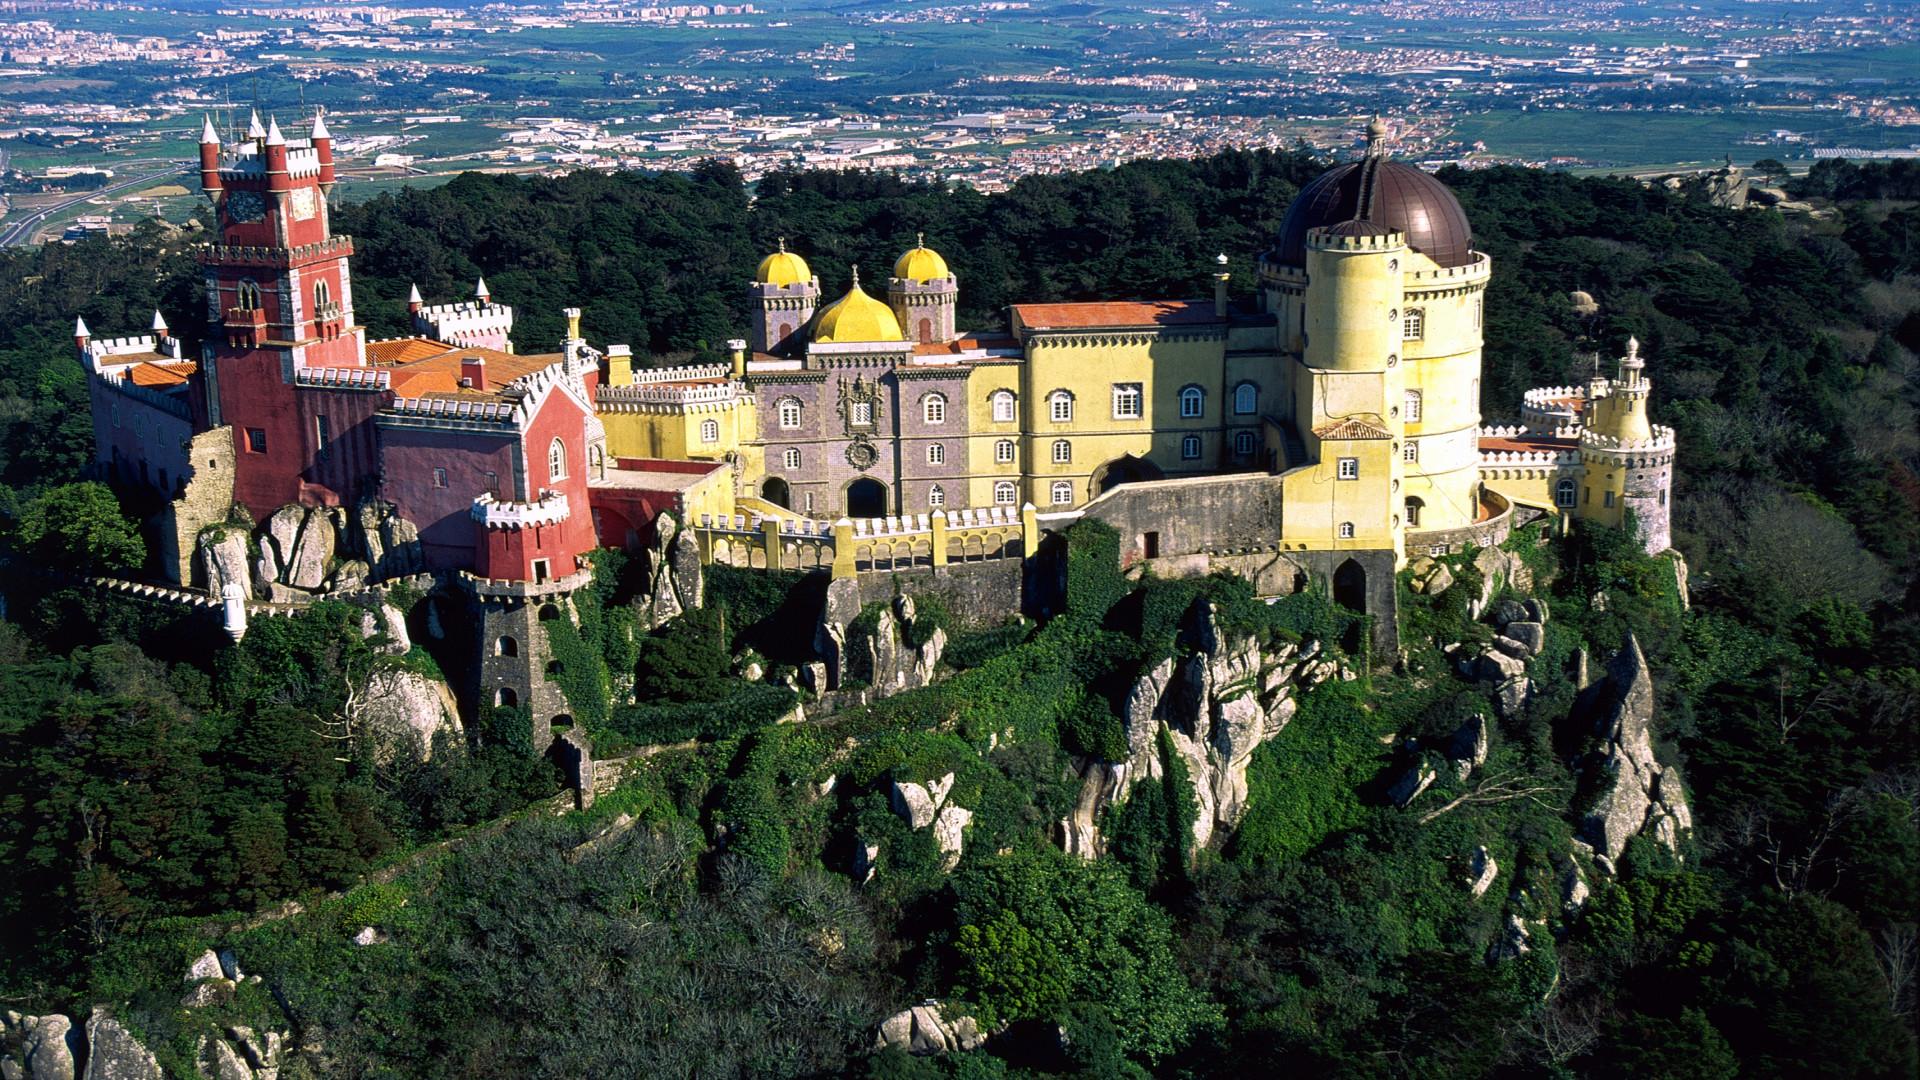 Sintra van bovenaf gezien, Lissabon kust, Portugal